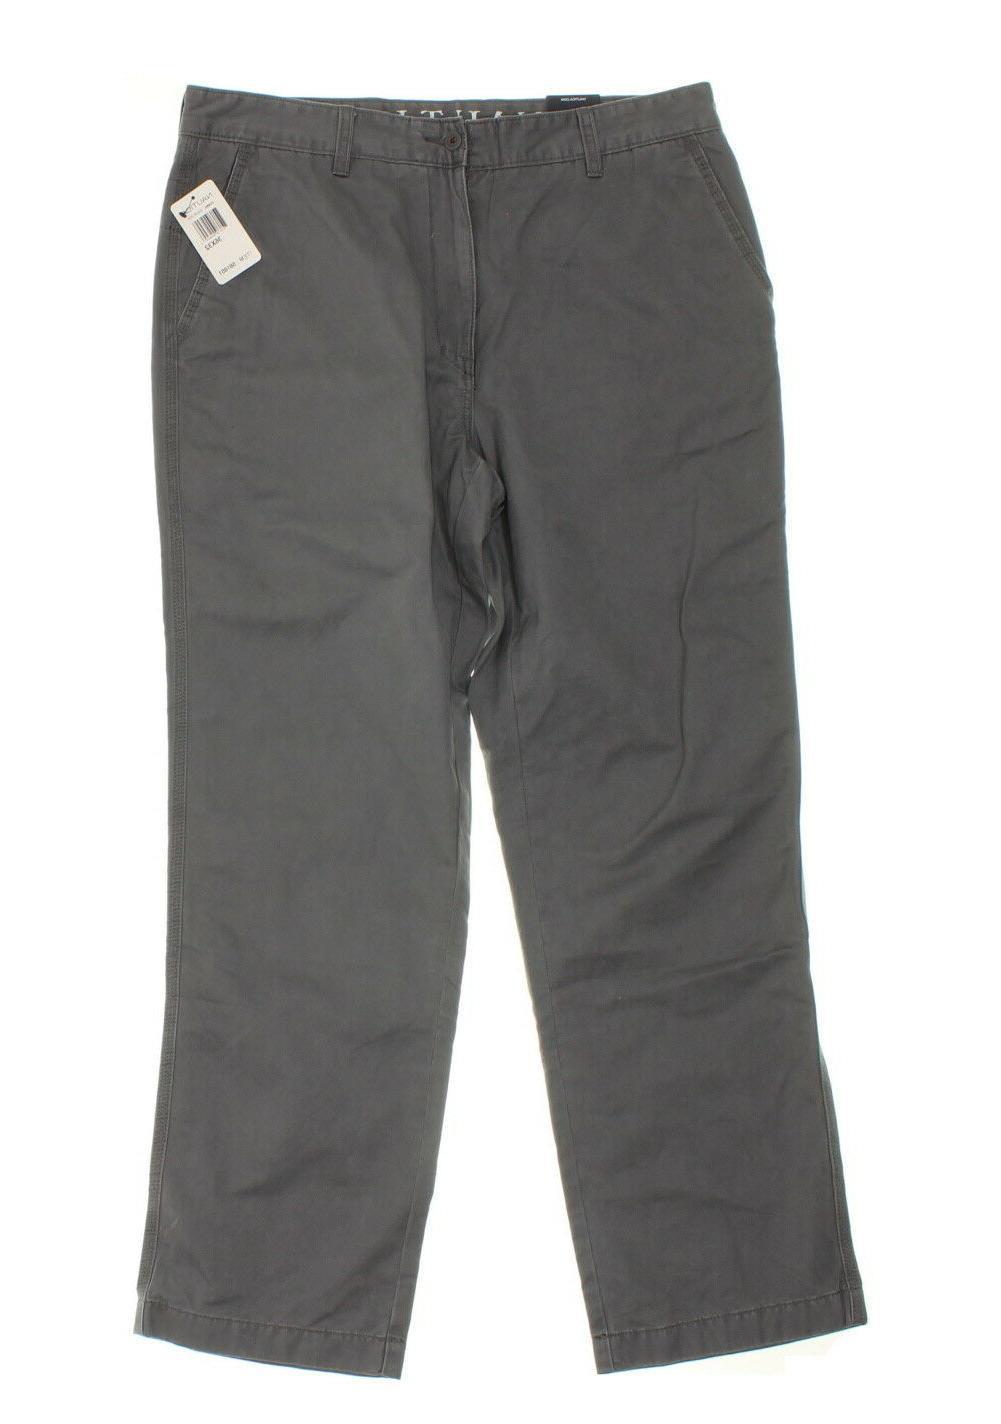 Pocket Casual Gray Size 36W 32L